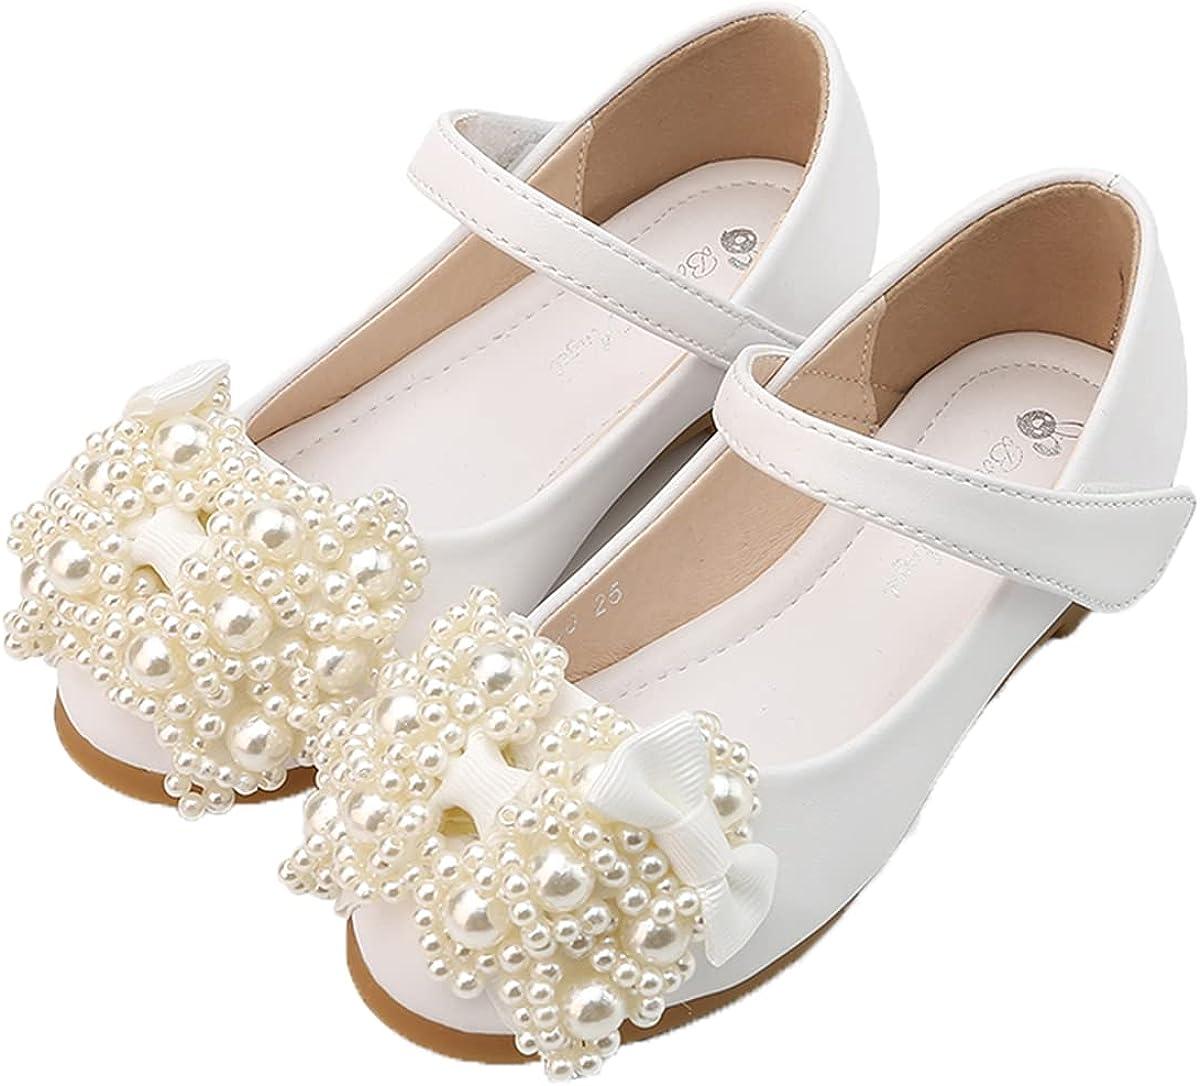 JOEupin Mary Jane Front Bow Heart Rhinestone Buckle Ballerina Flat (Toddler/Little Girl)